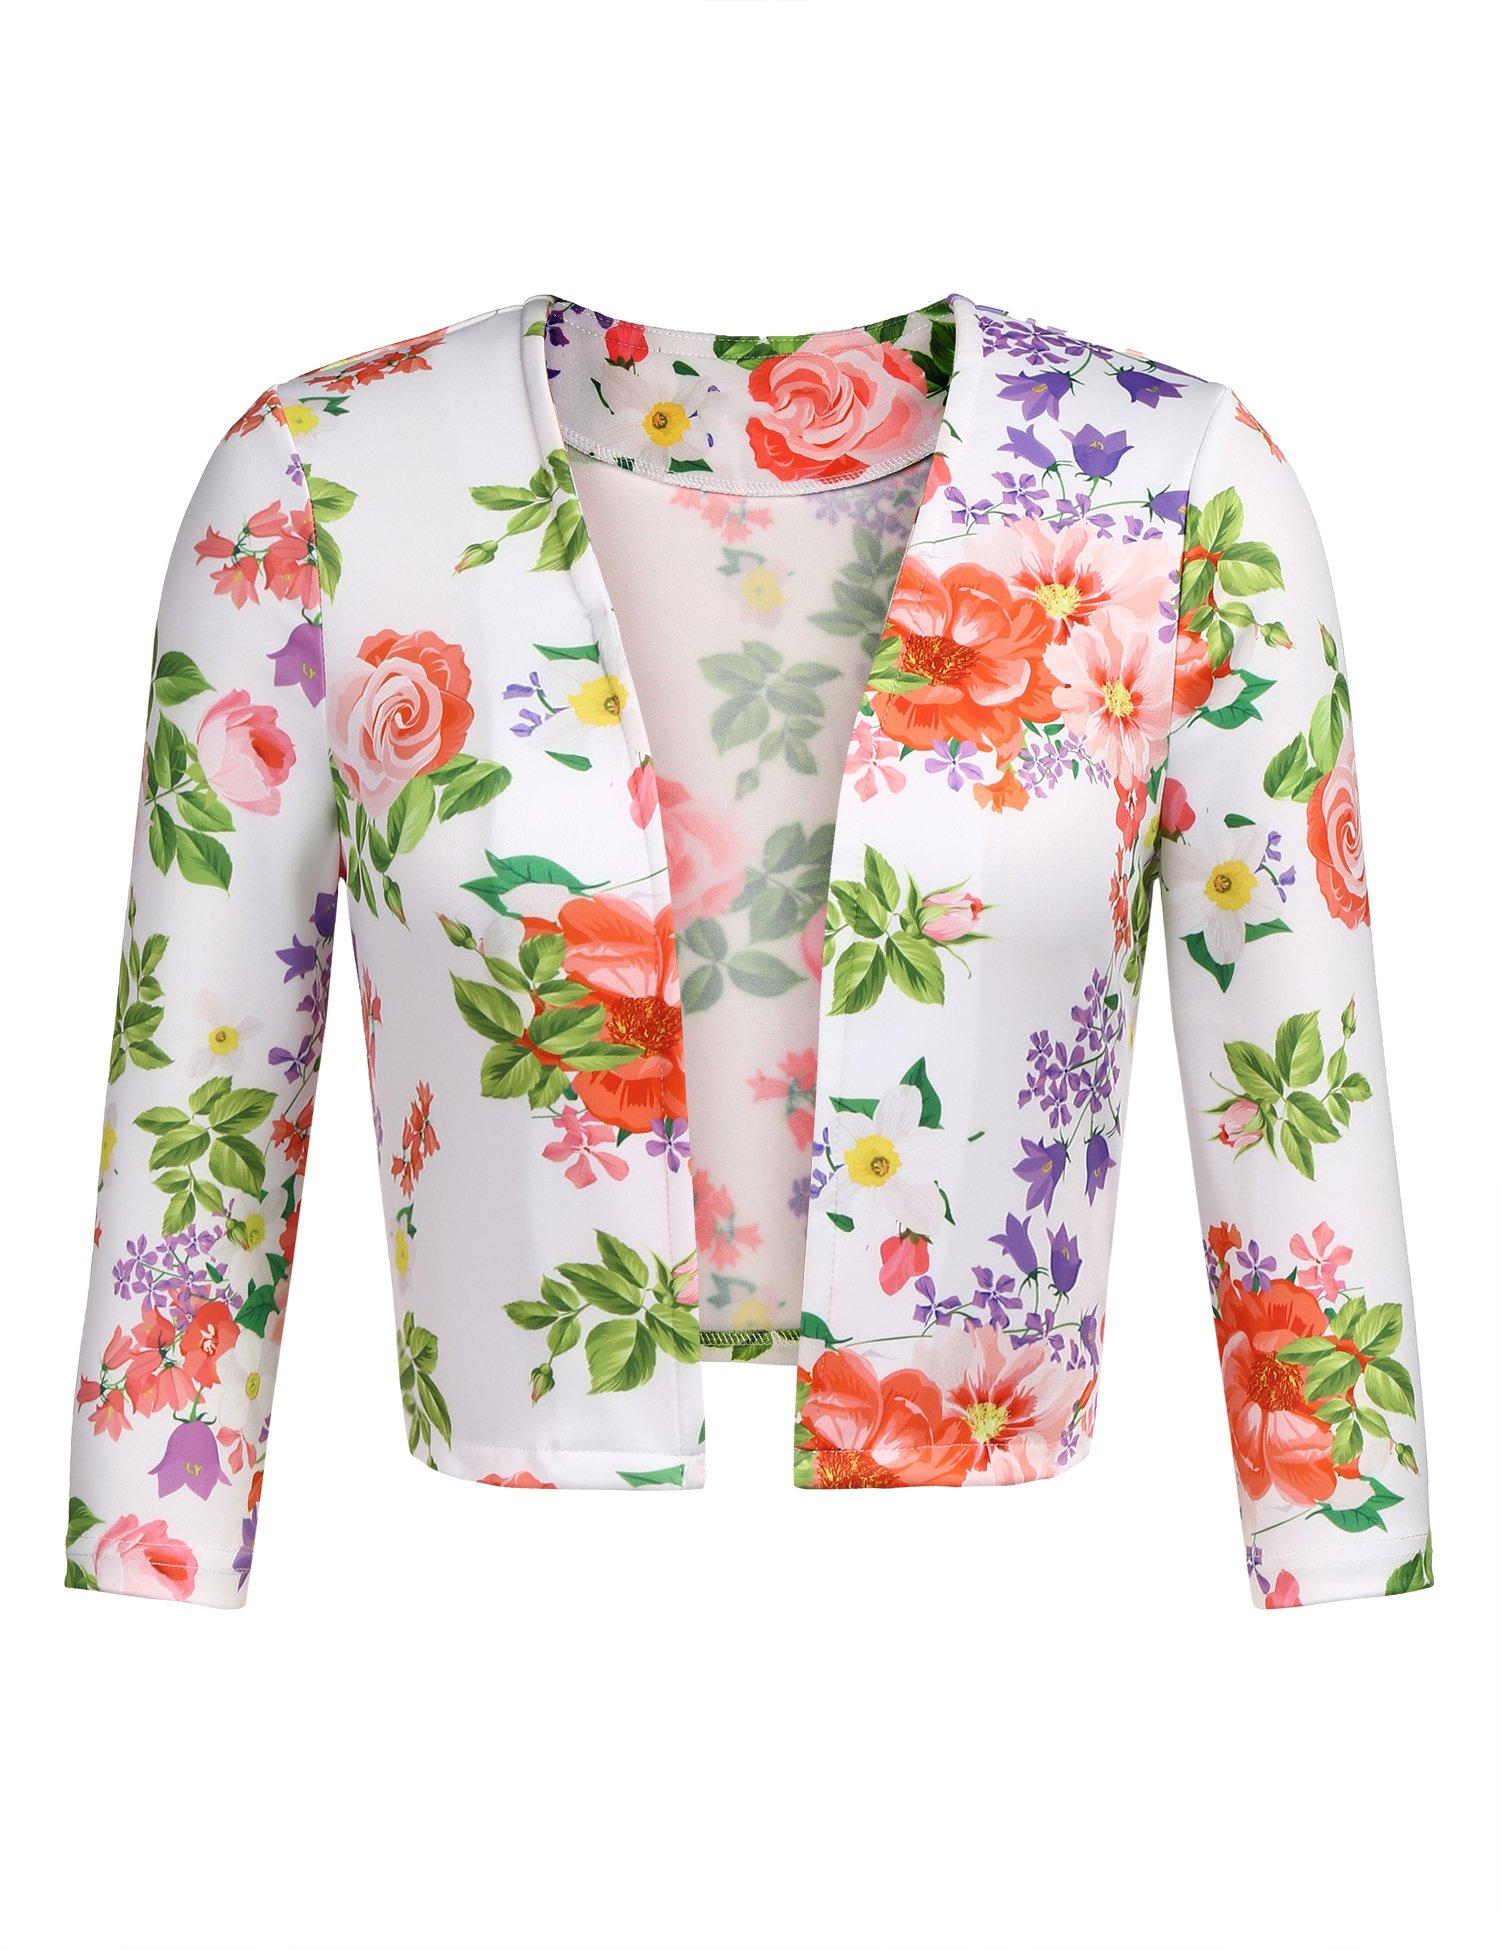 Zeagoo Women Shrug Jacket Vintage Floral Print Blazer 3/4 Sleeve Coat Casual Outerwear Tops White XL,Floral-white,X-Large